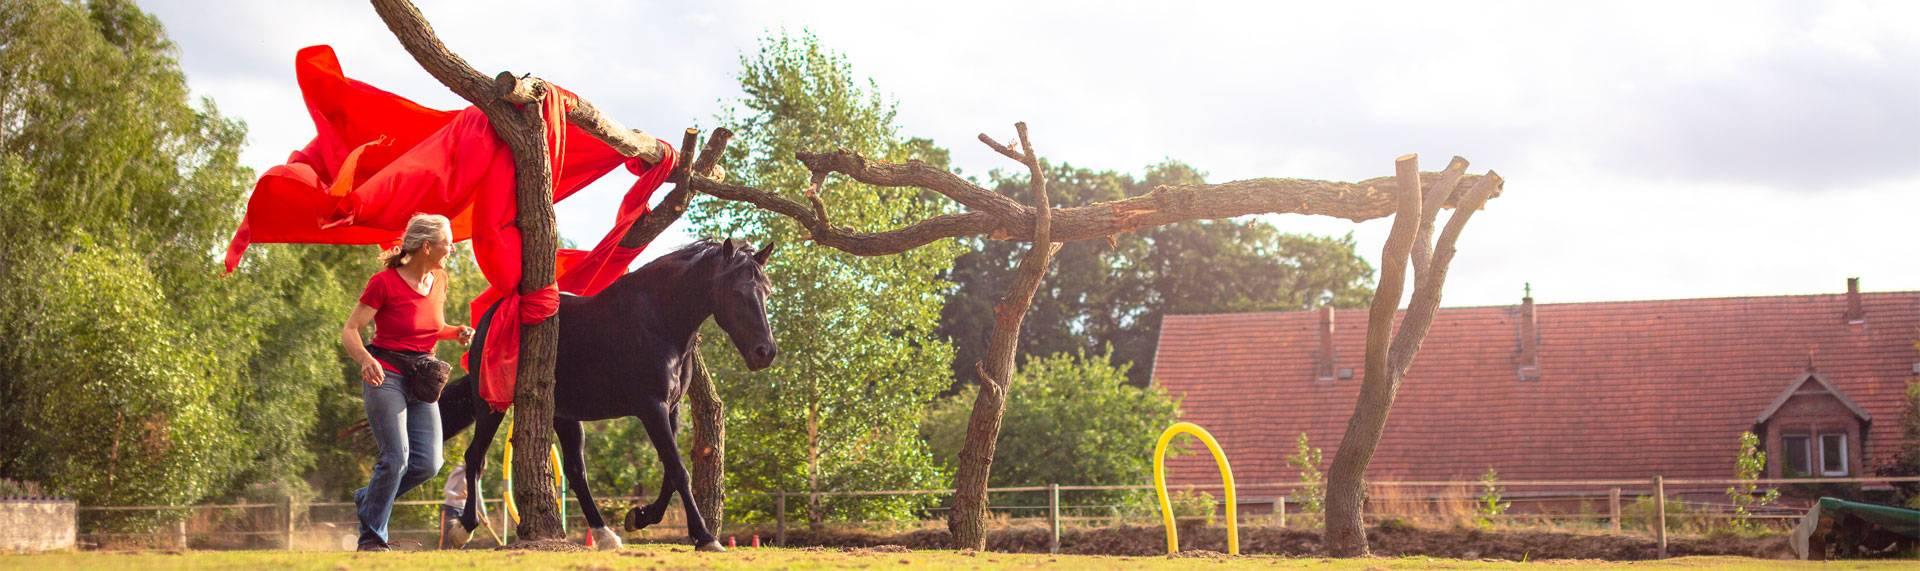 True Horse Agility mit Pferdetrainerin Nina Steigerwald